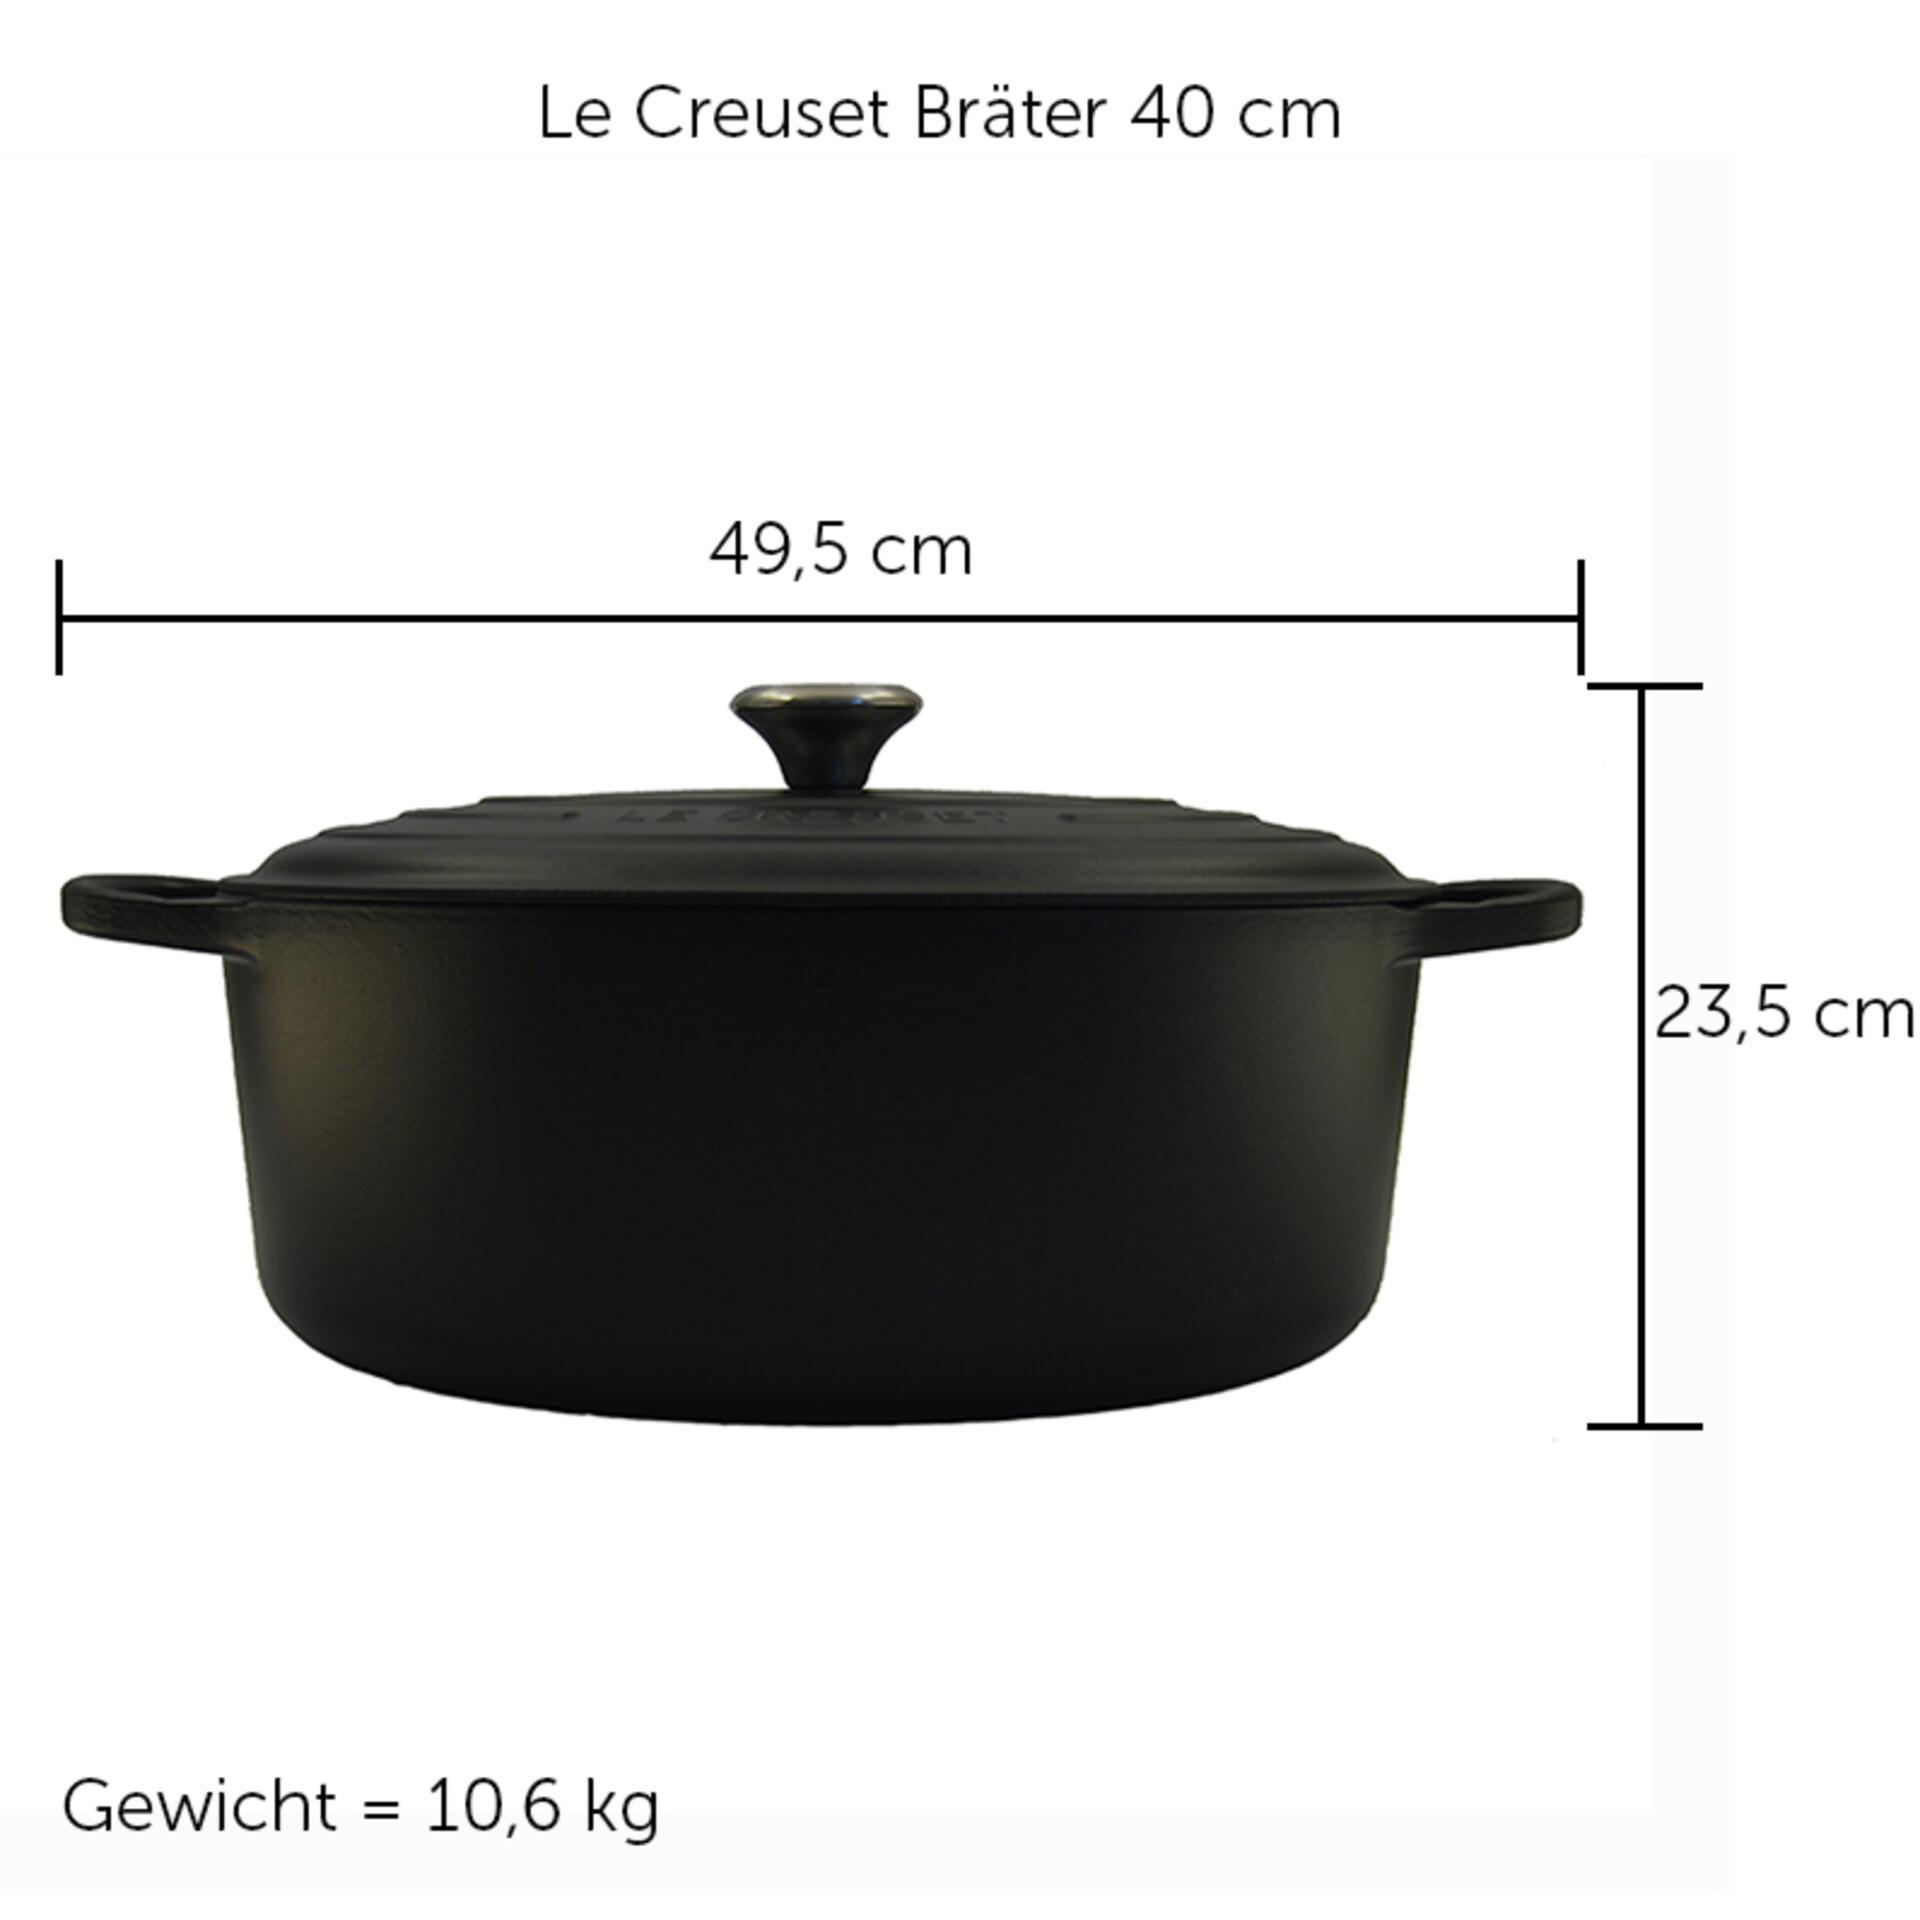 Le Creuset Bräter Signature 40 cm oval Schwarz 13,9 L